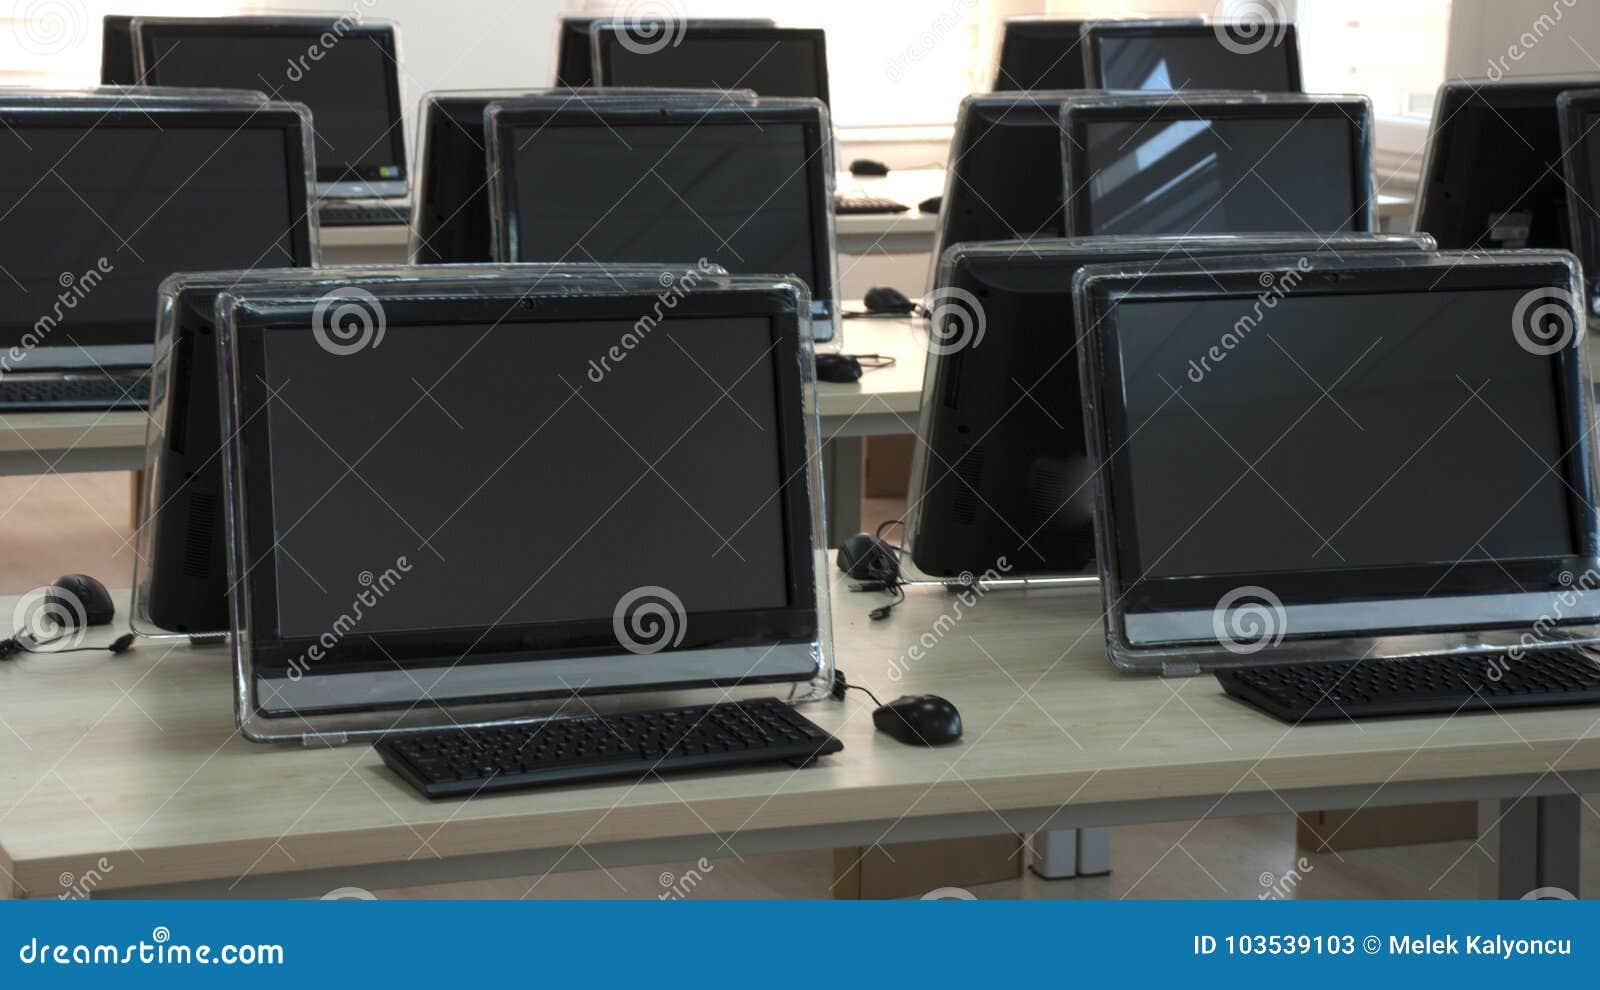 Student Computer Laboratory Stock Image - Image of ...